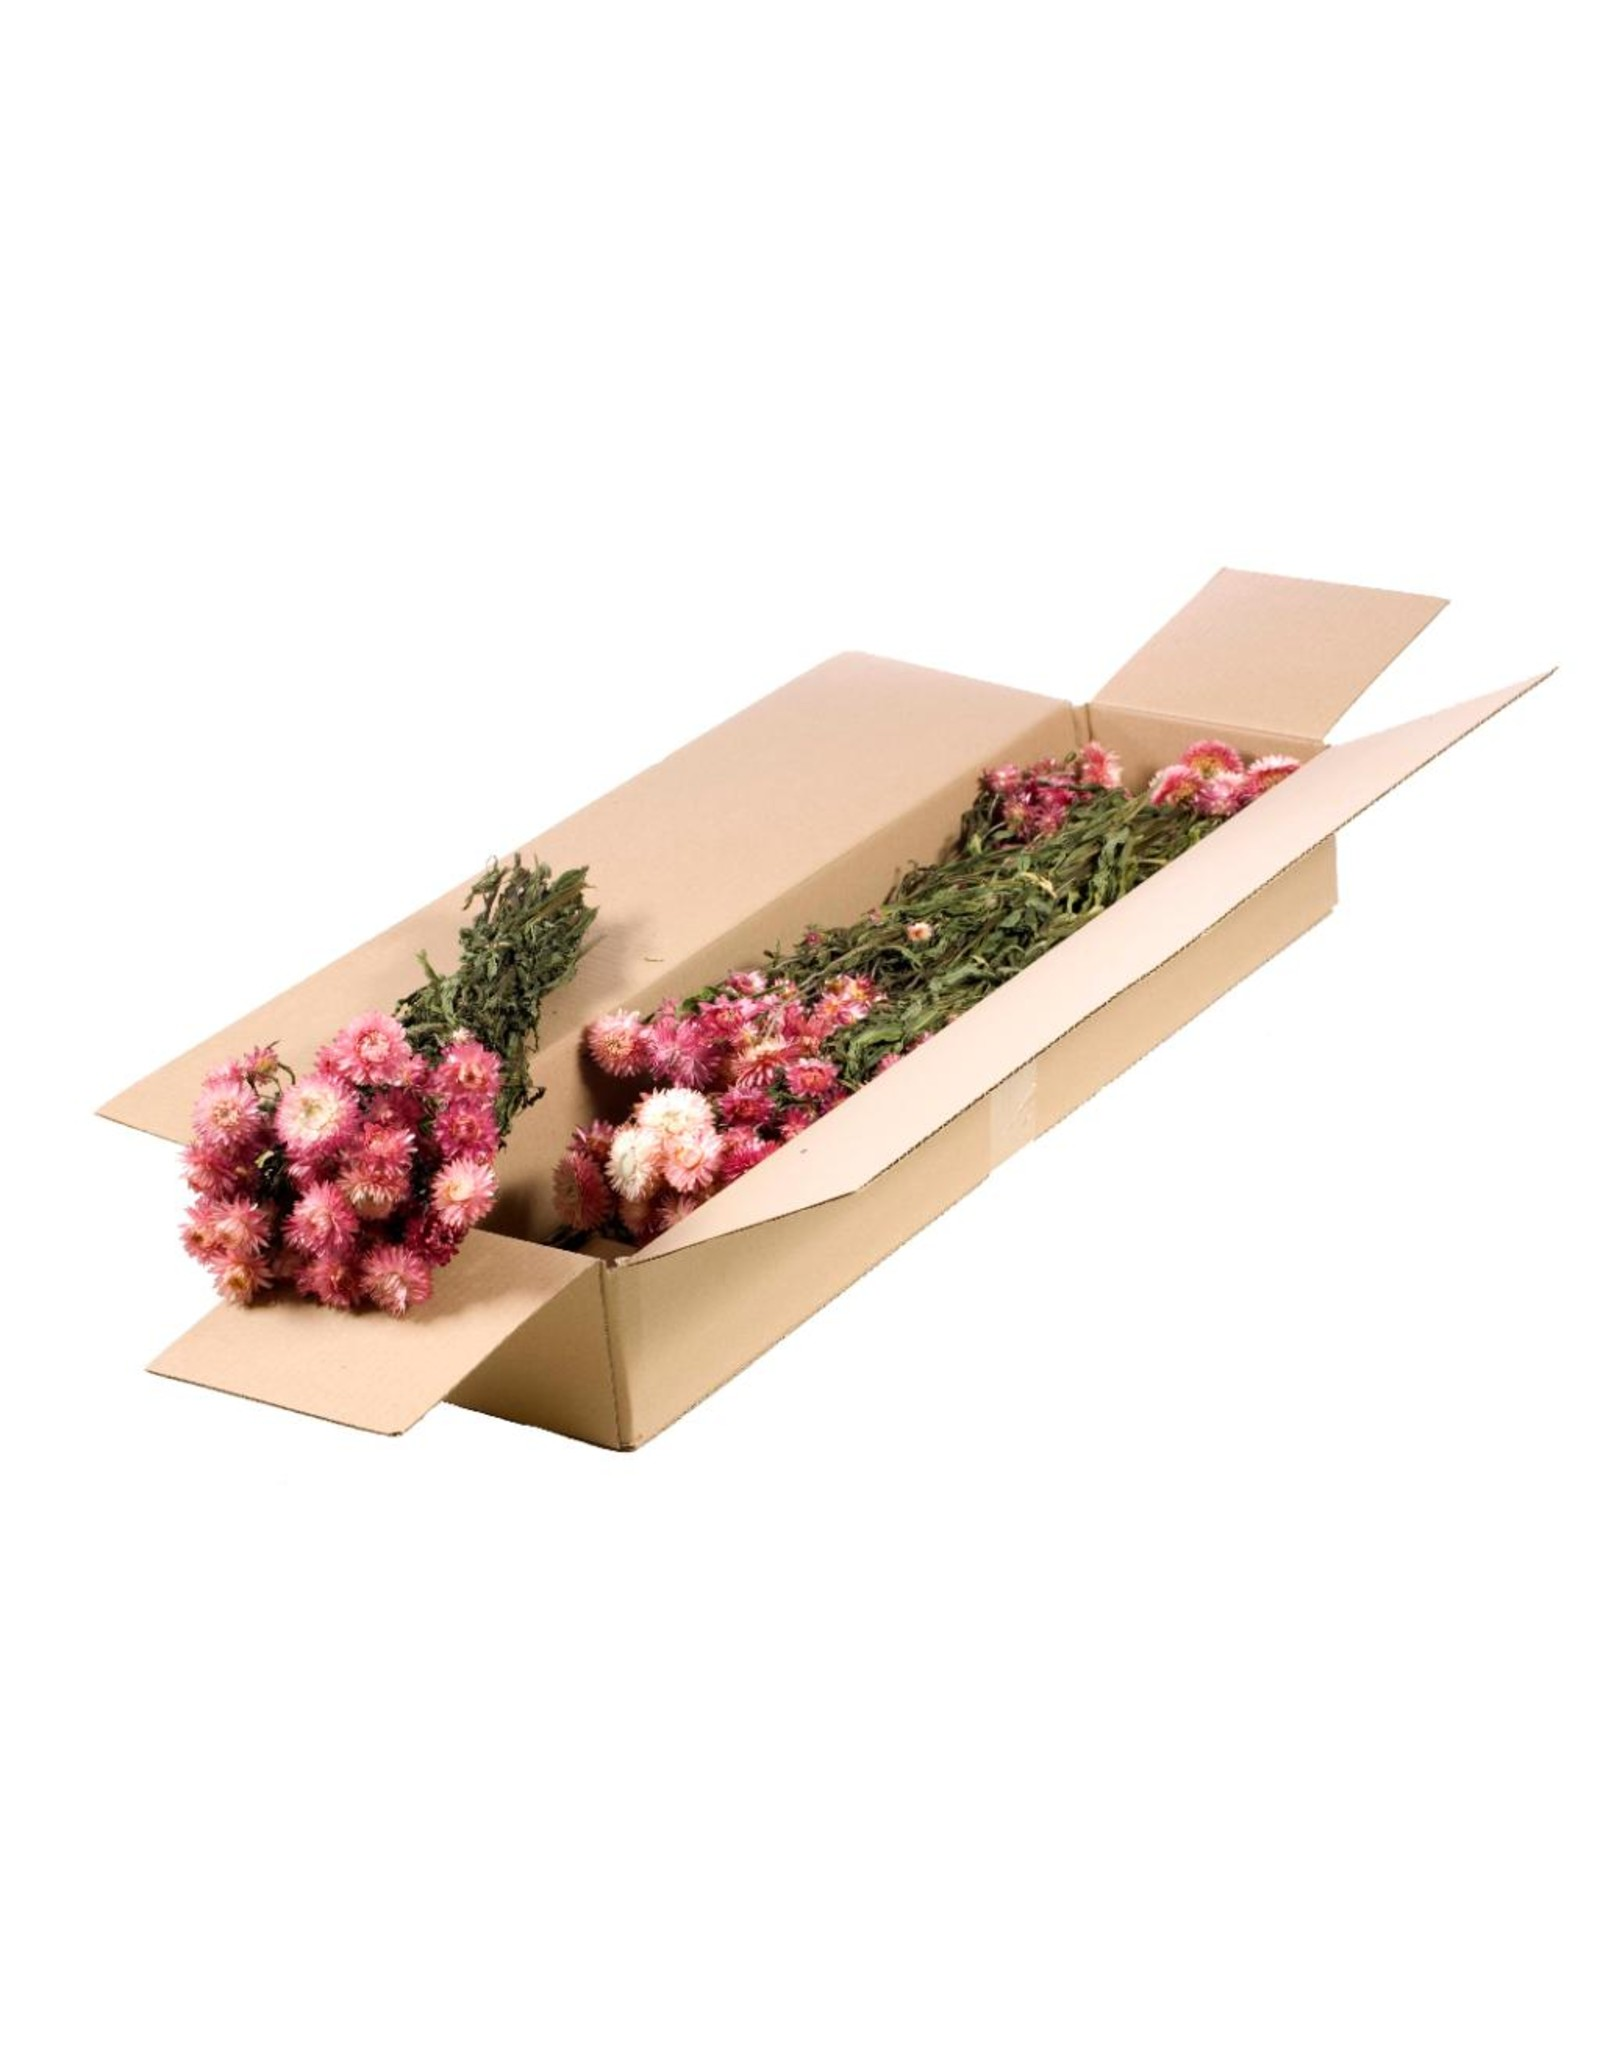 Helichrysum SB natural pink x 5